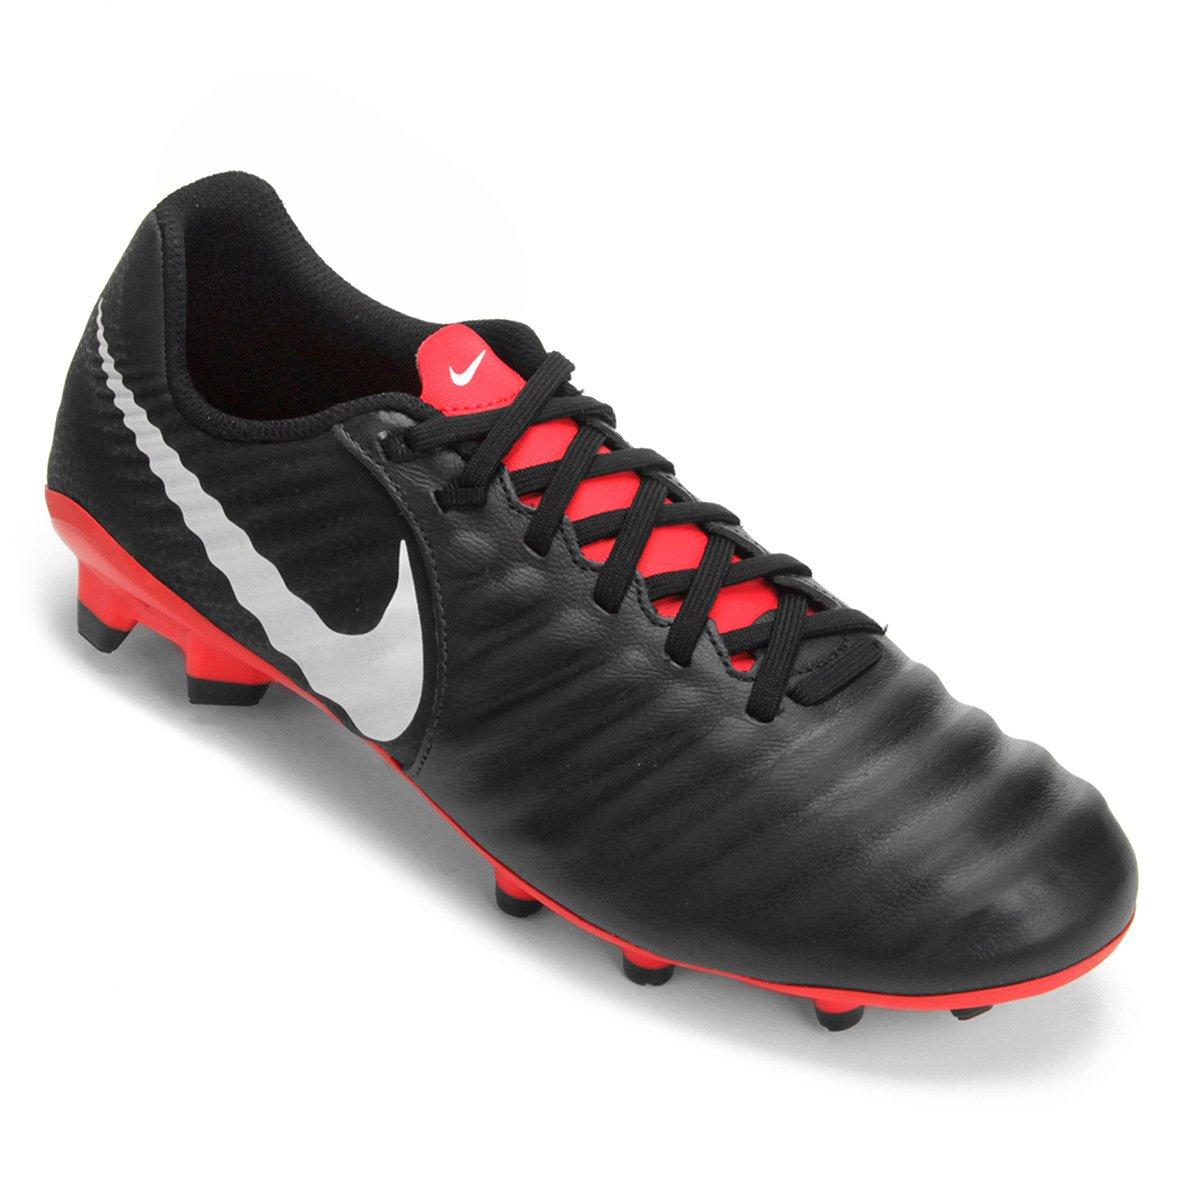 premium selection ebdc5 3d9f3 Chuteira Campo Nike Tiempo Legend 7 Academy FG - Preto